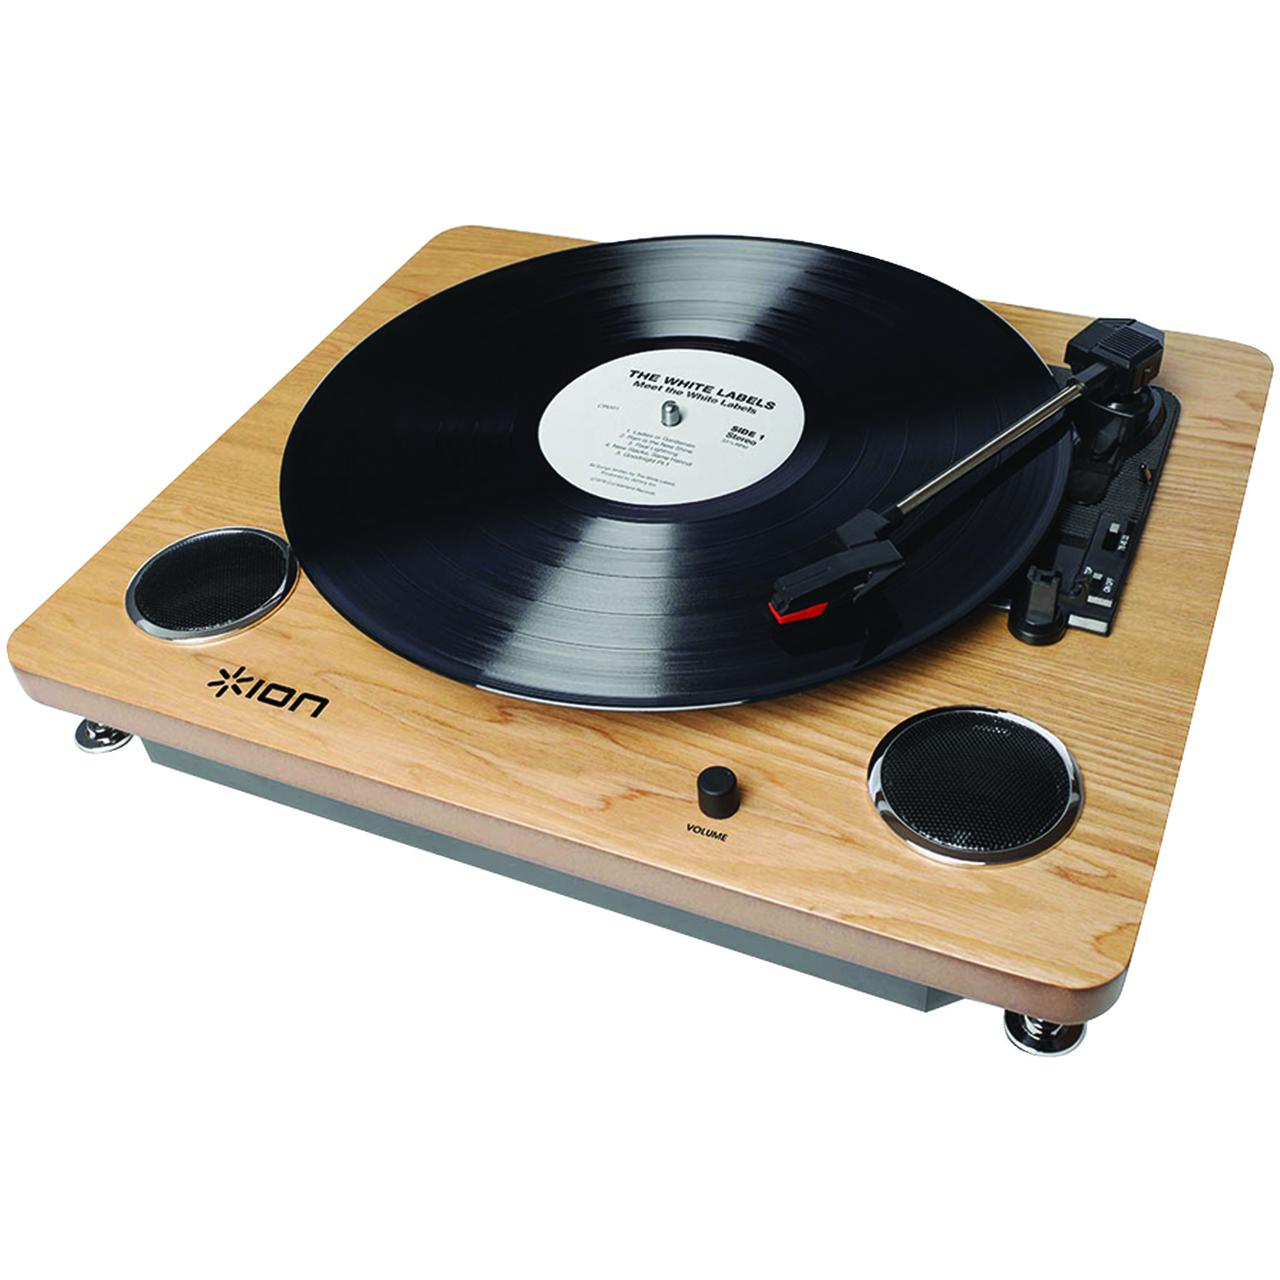 ION IT53L Archive LP Turntable